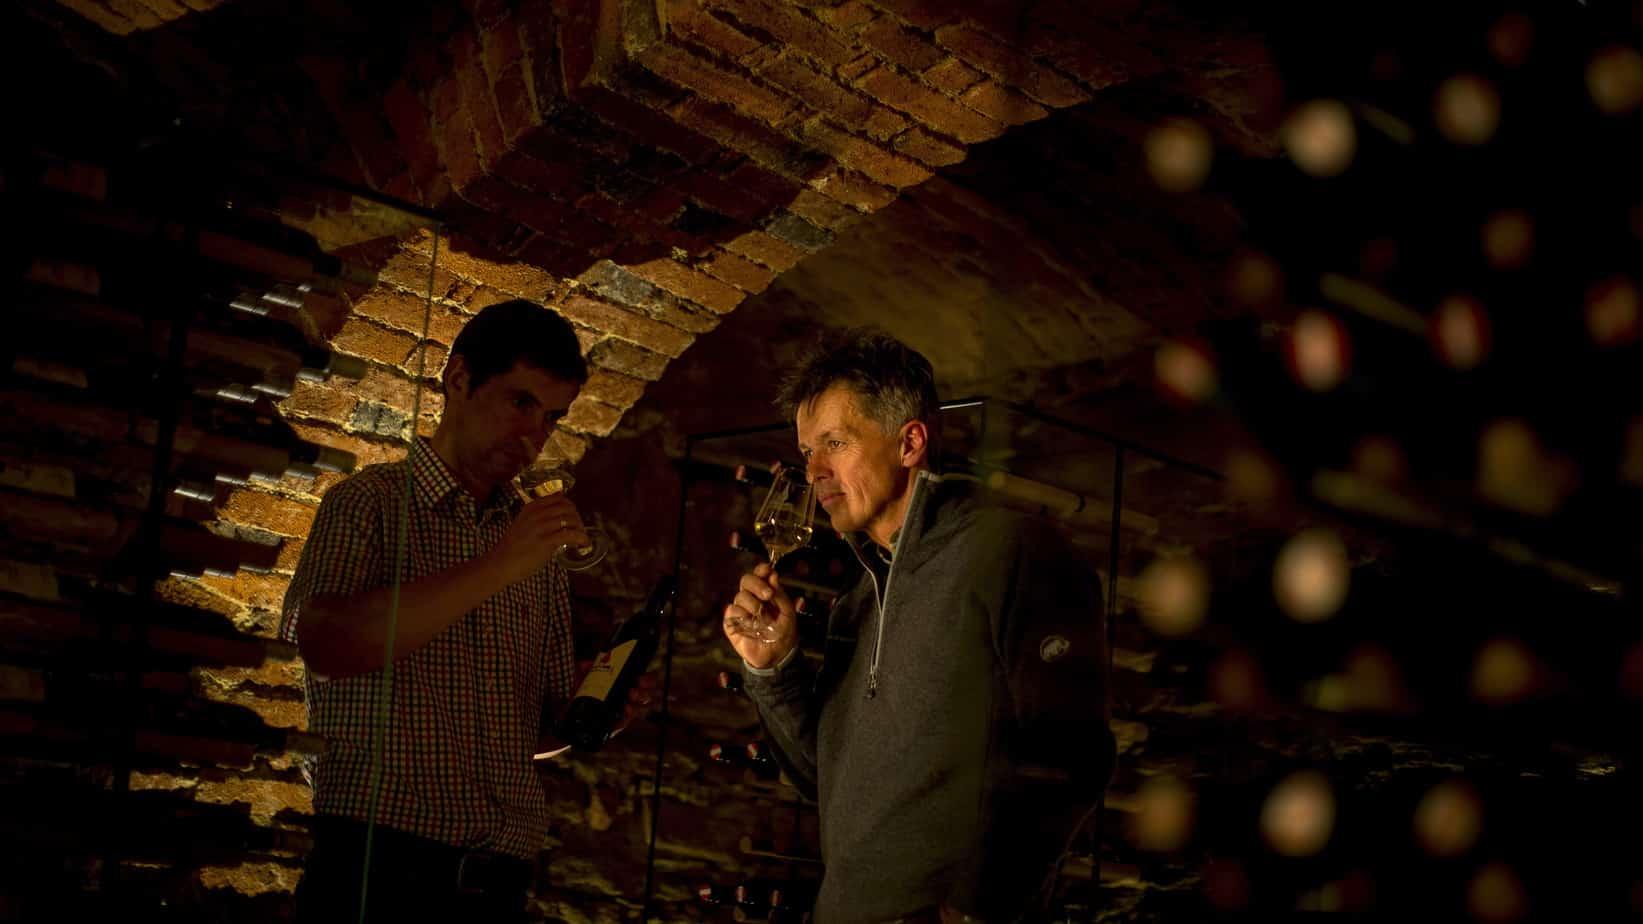 Vinprovning på Weingut Frühwirth i Deutsch Haseldorf bei Klöch - Südoststeiermark Semester i Österrike med Austria Travel